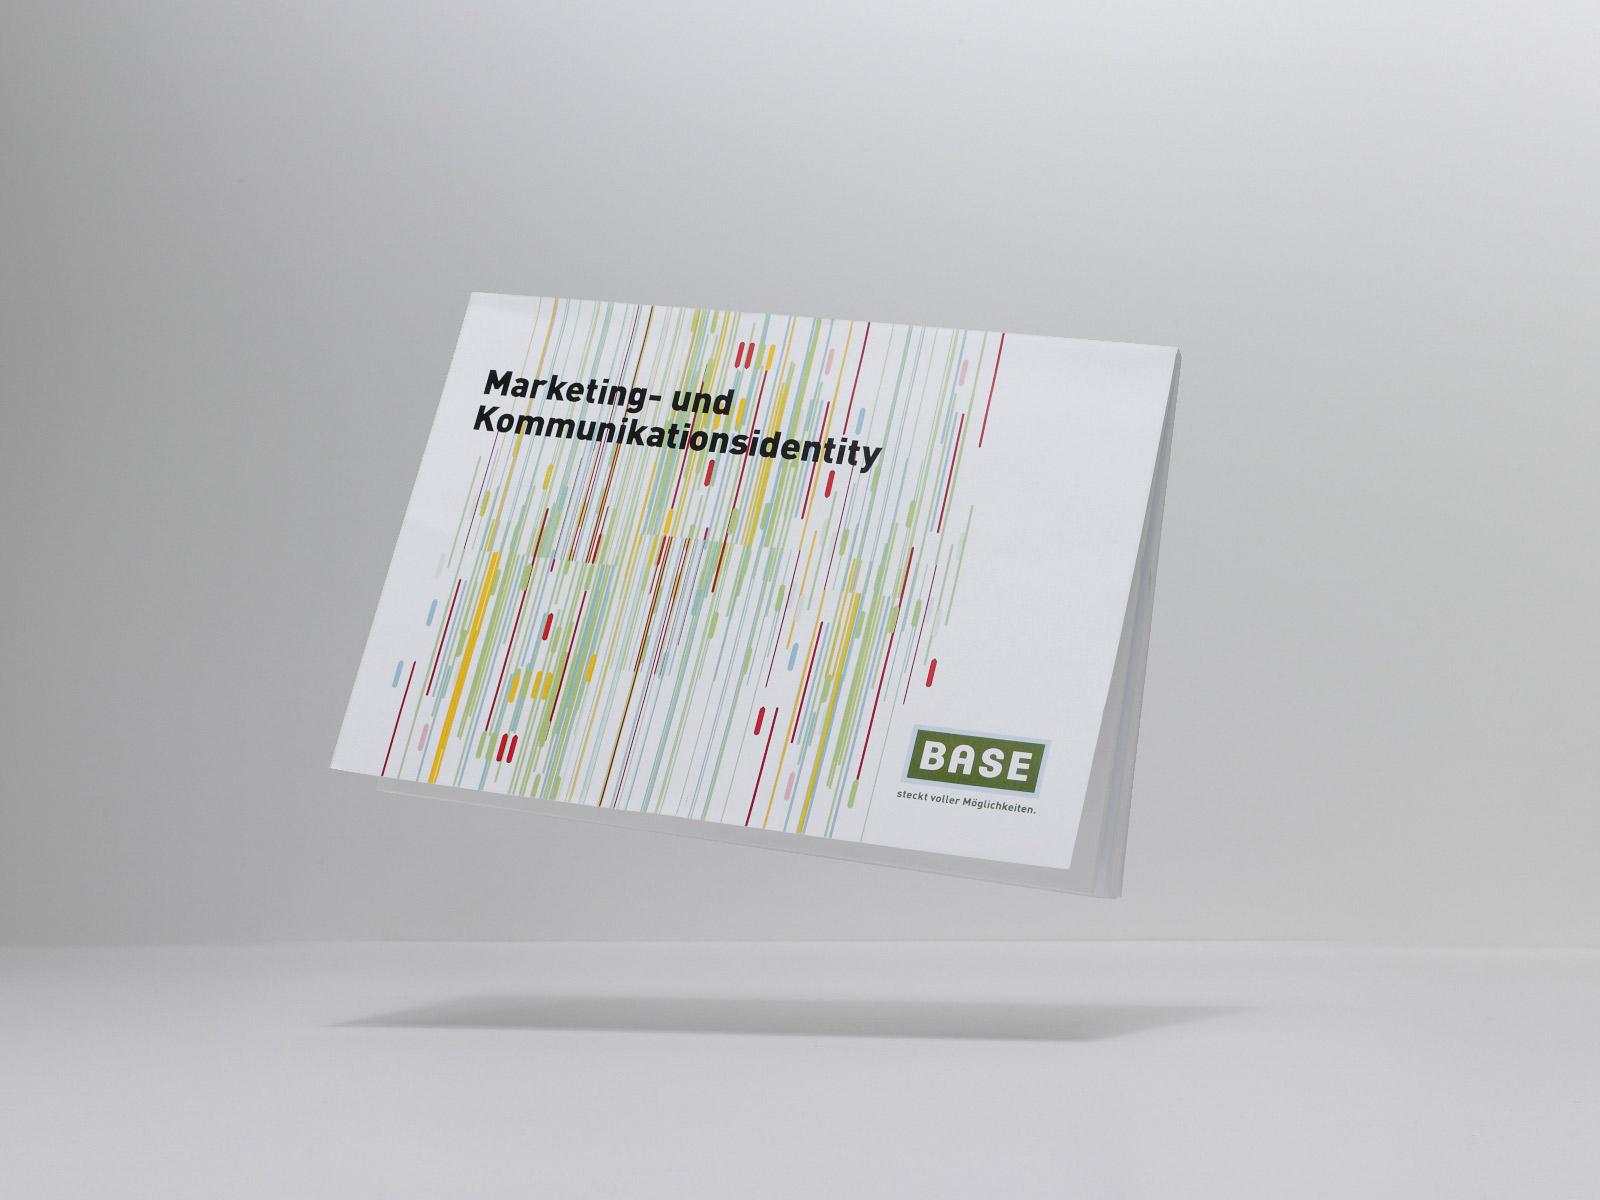 studio-oeding_base_03